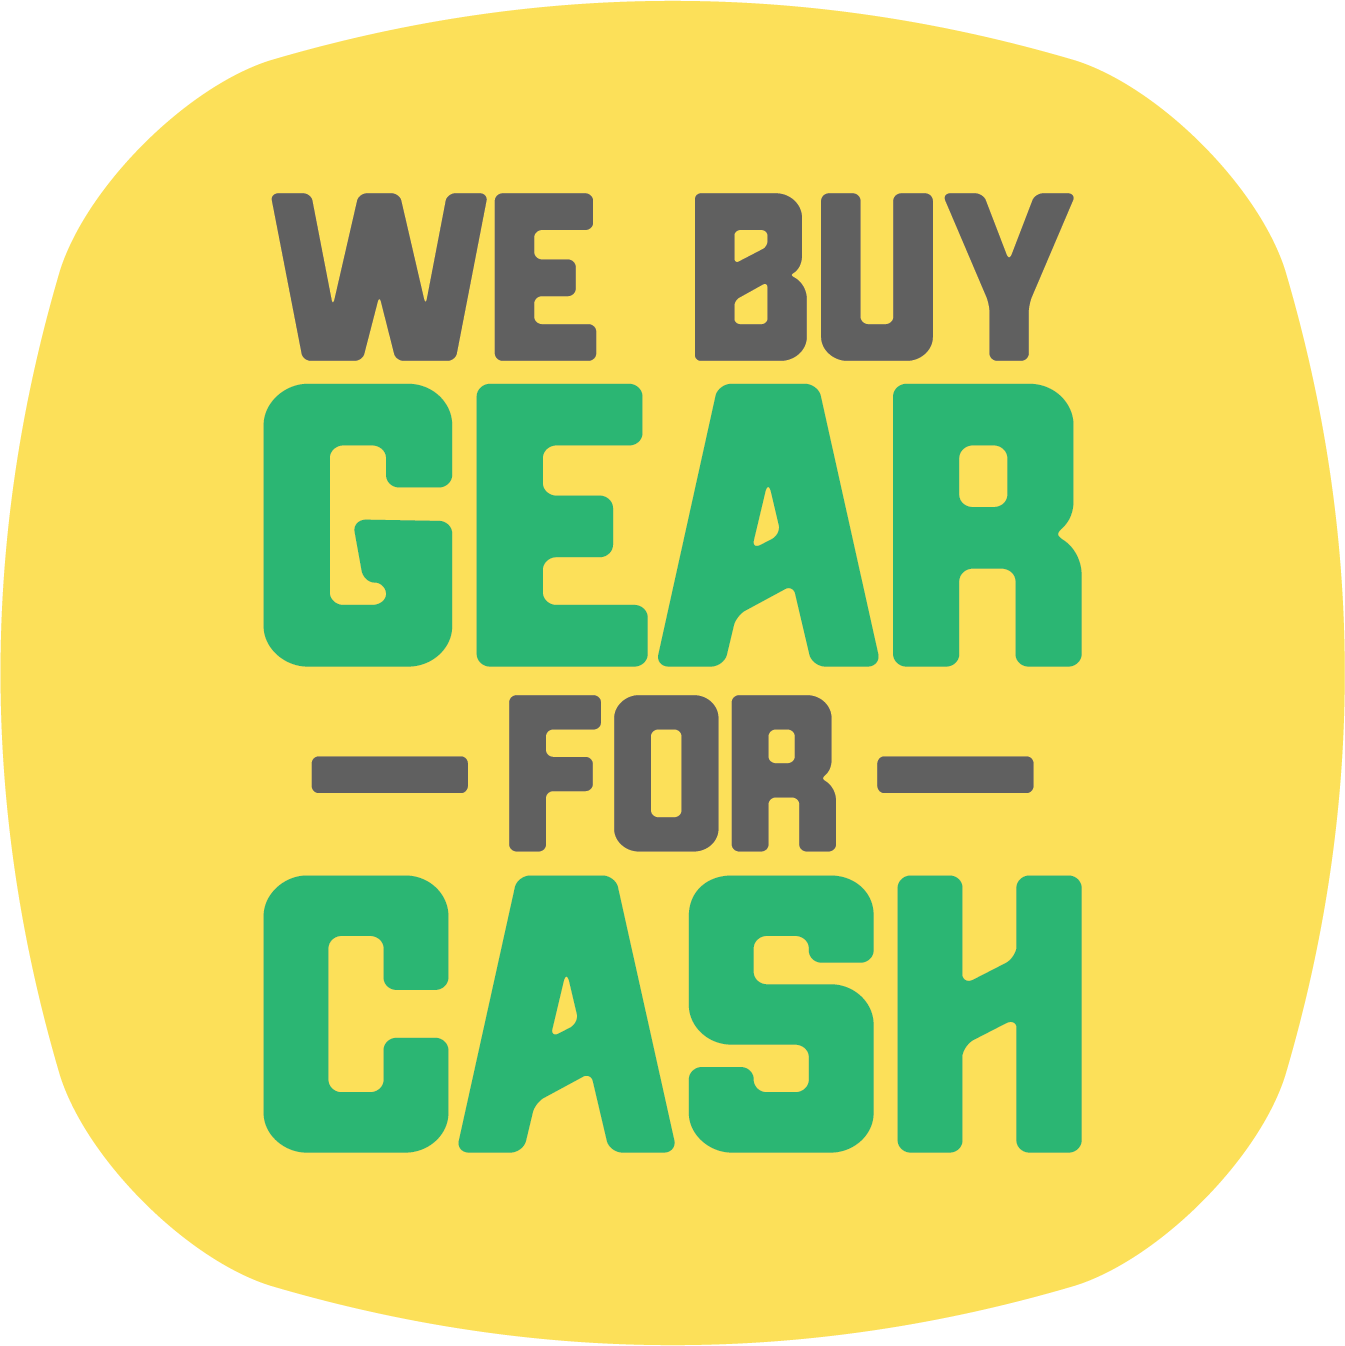 We Buy Gear For Cash!